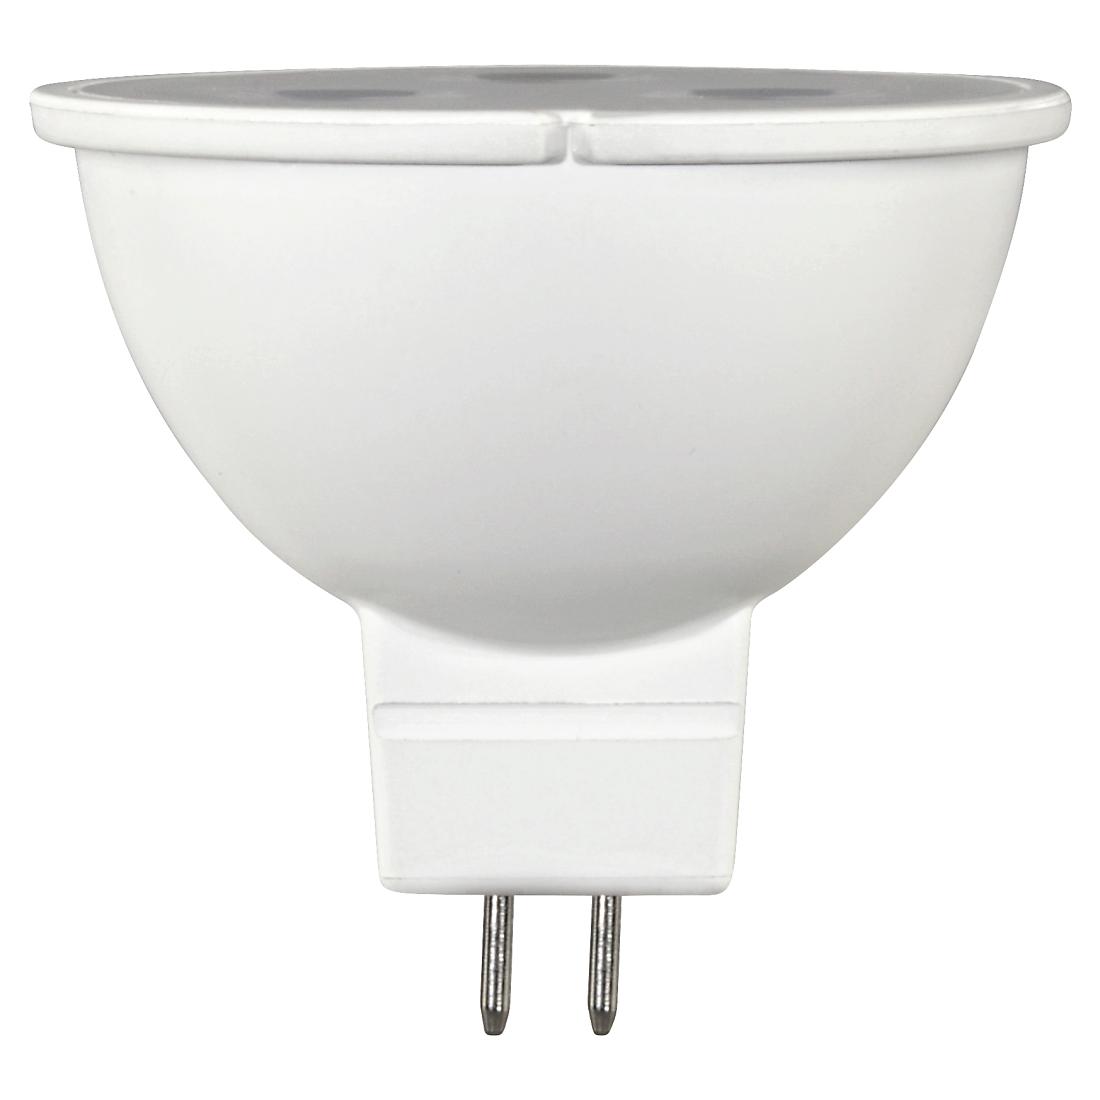 Xavax - Die Starke Marke im Haushalt xavax.eu | 00112510 Xavax LED ...